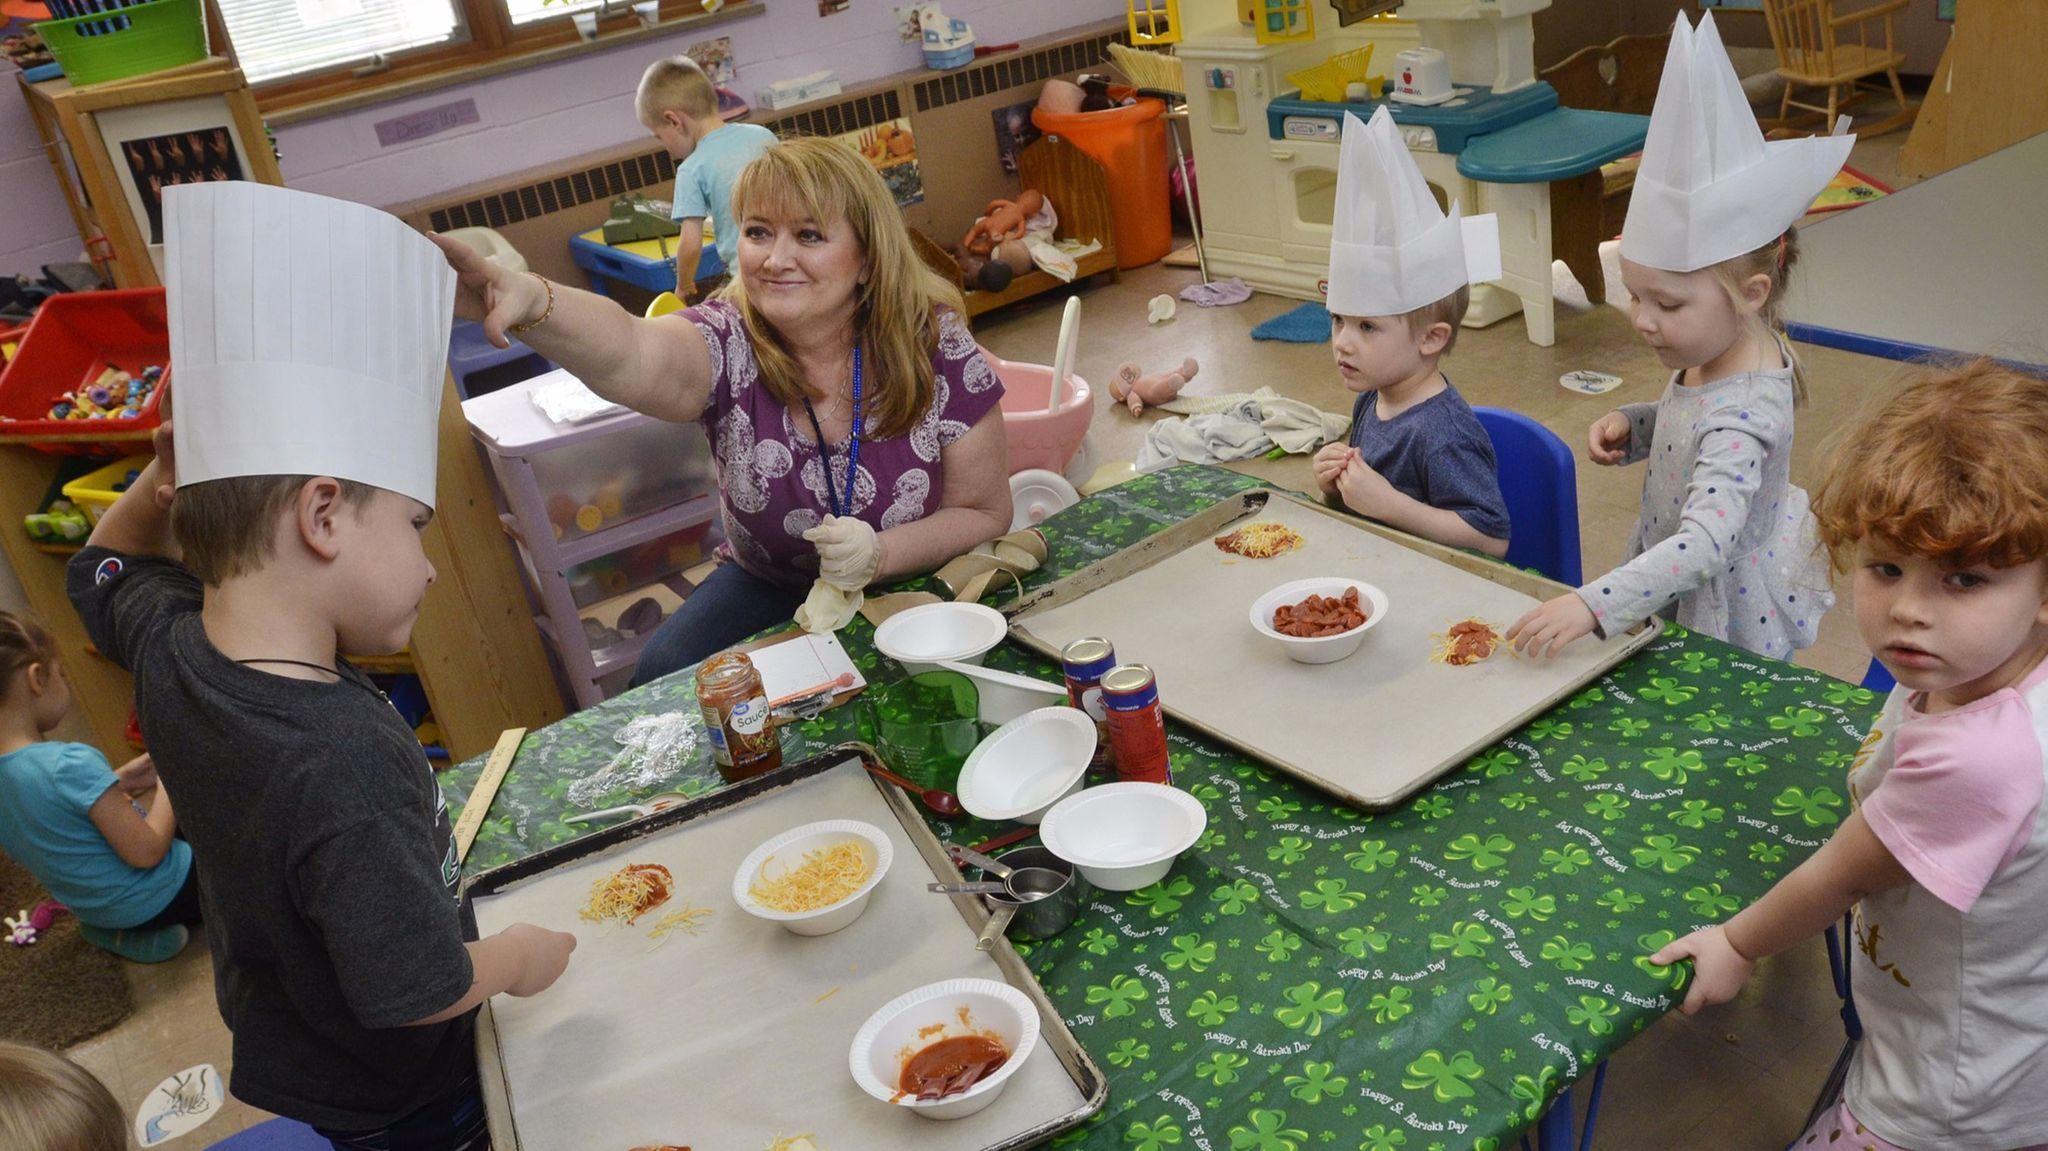 Teacher Debbie Kukuris-Milford helps preschoolers adjust their chef's hats and make pizzas at Westminster Preschool in Marion, Ind.